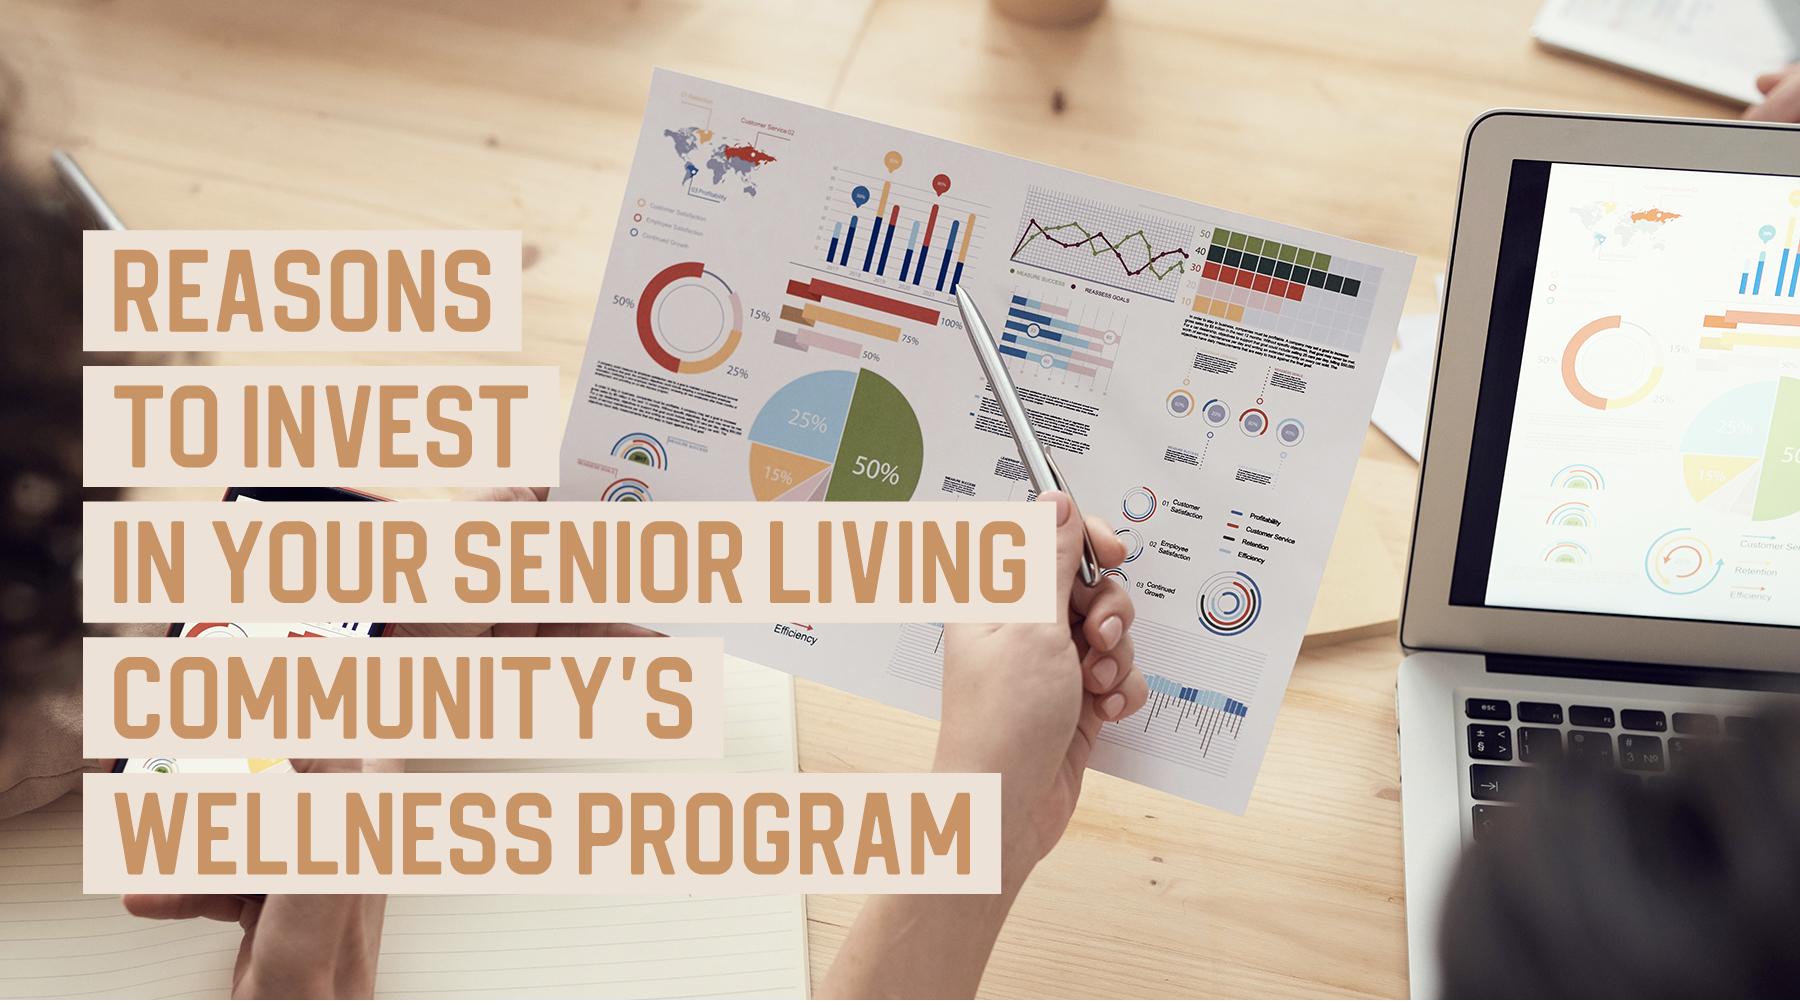 Reasons to Invest in Your Senior Living Community's Wellness Program